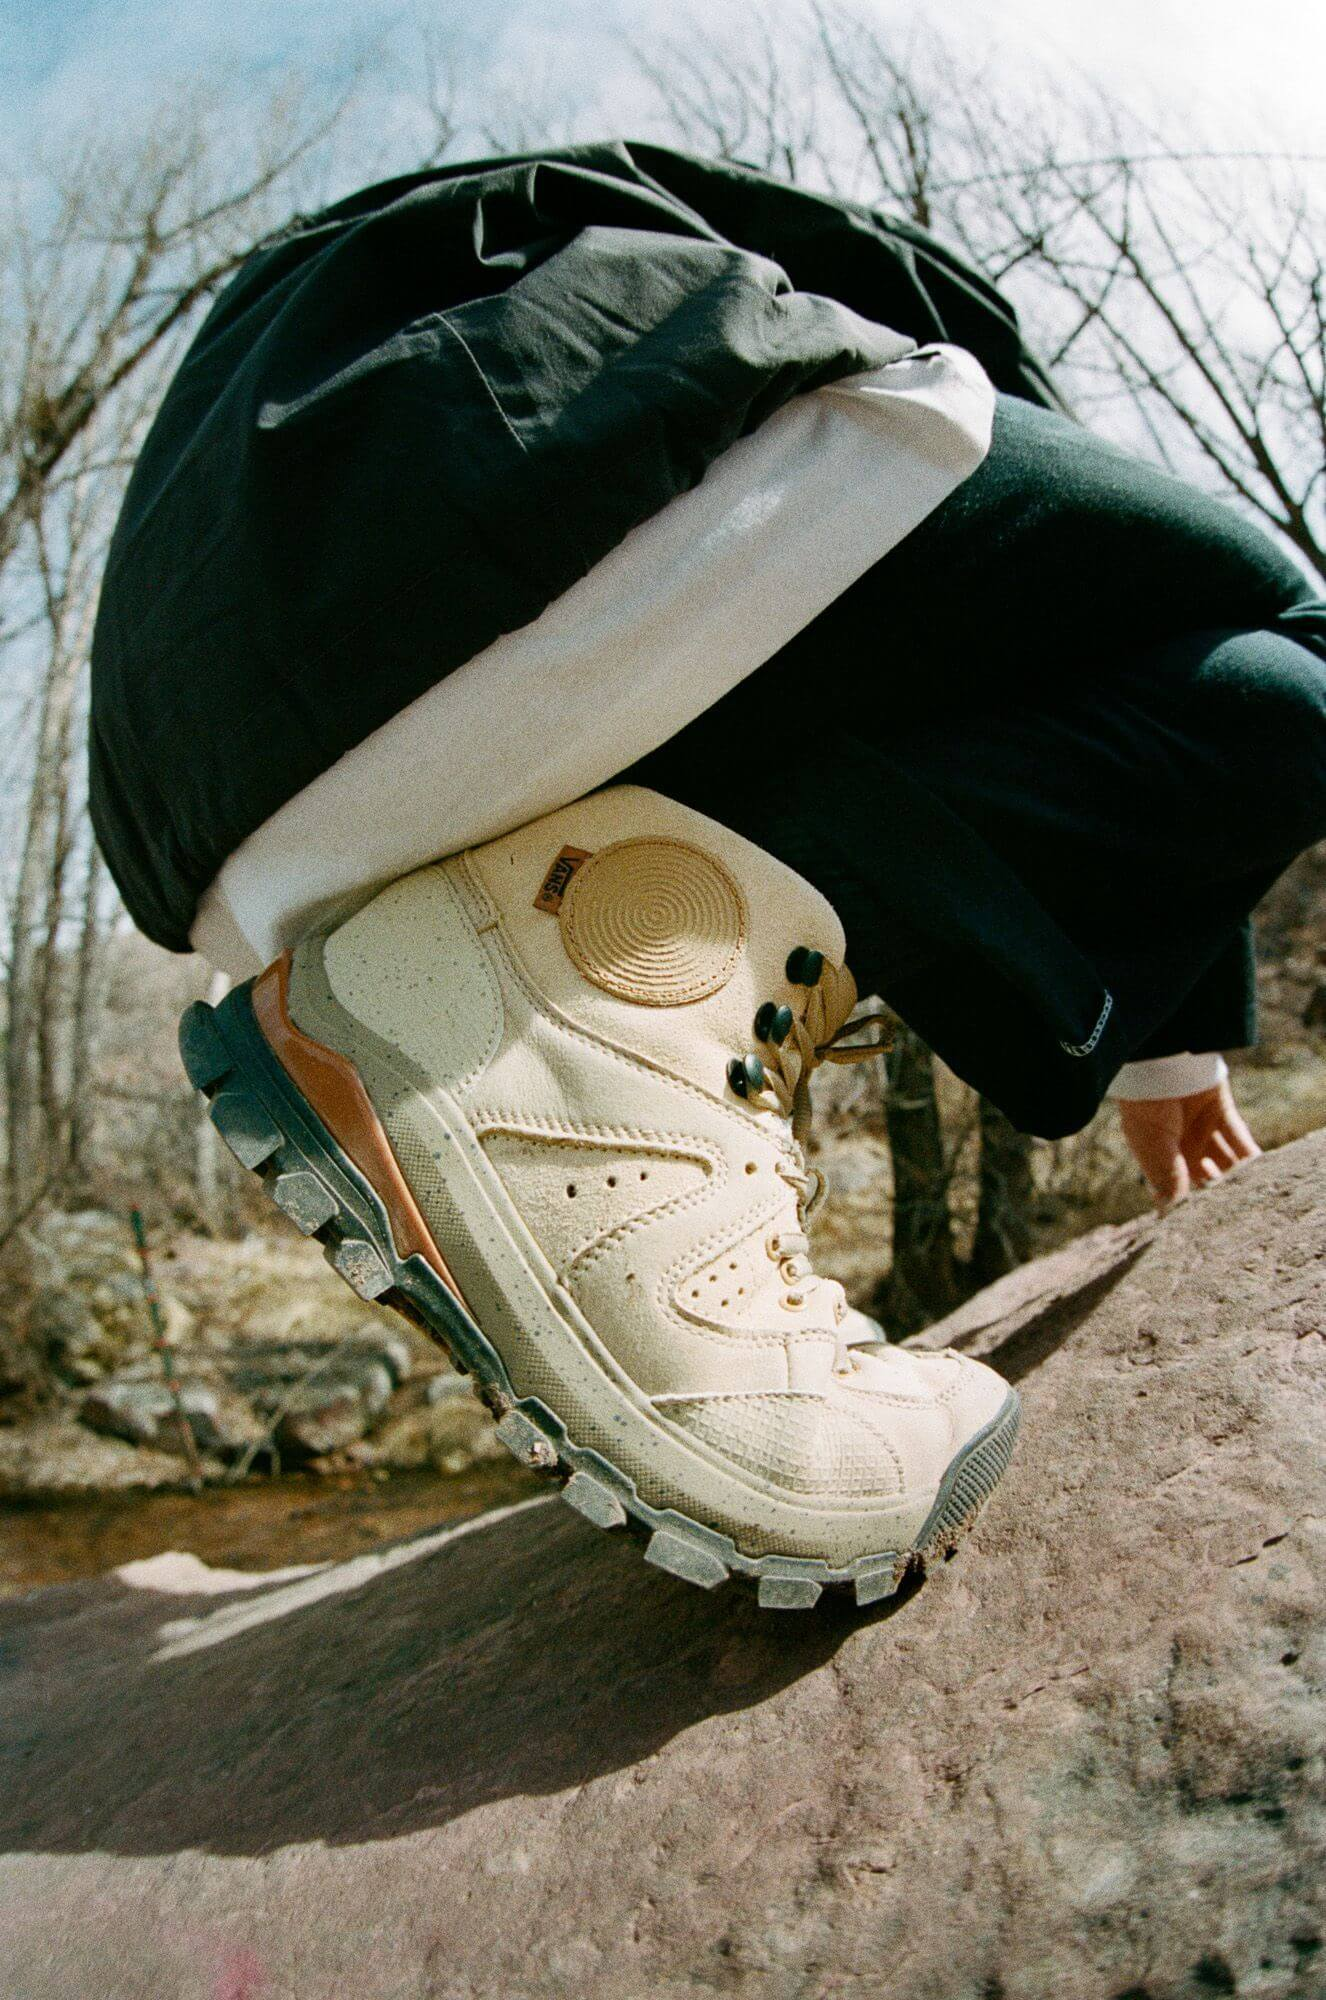 Vault by Vans x Taka Hayashi - AMZN TRLV3 LX Boot - marzipan/pebble on feet